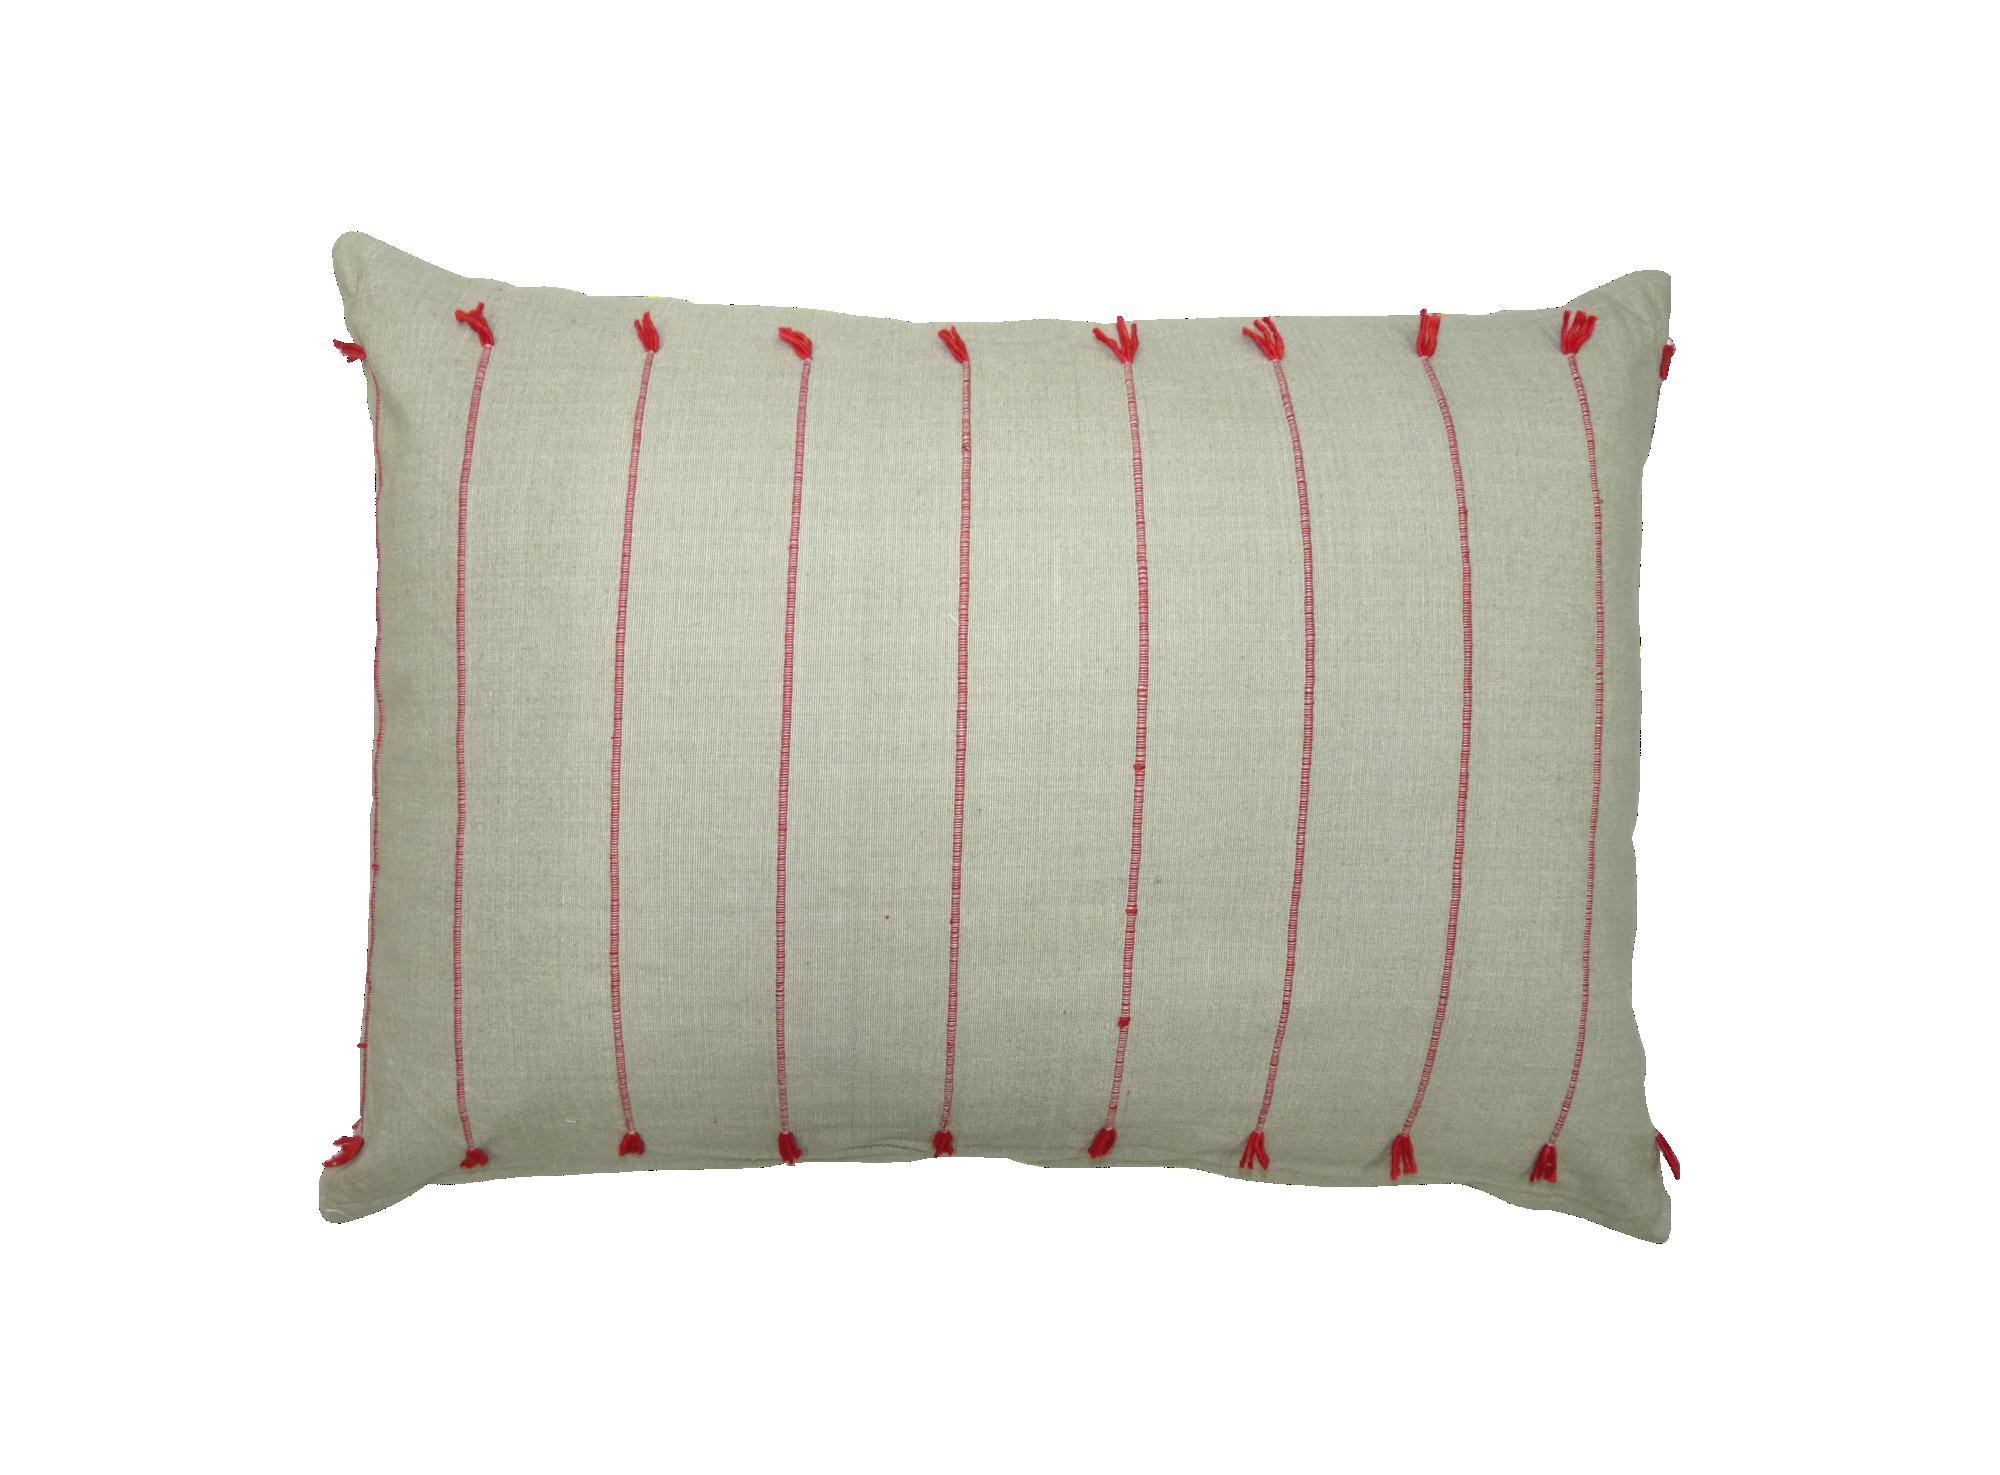 Coussin 30x50 revetu 100% coton garni 100% polyester coloris naturel/ ...